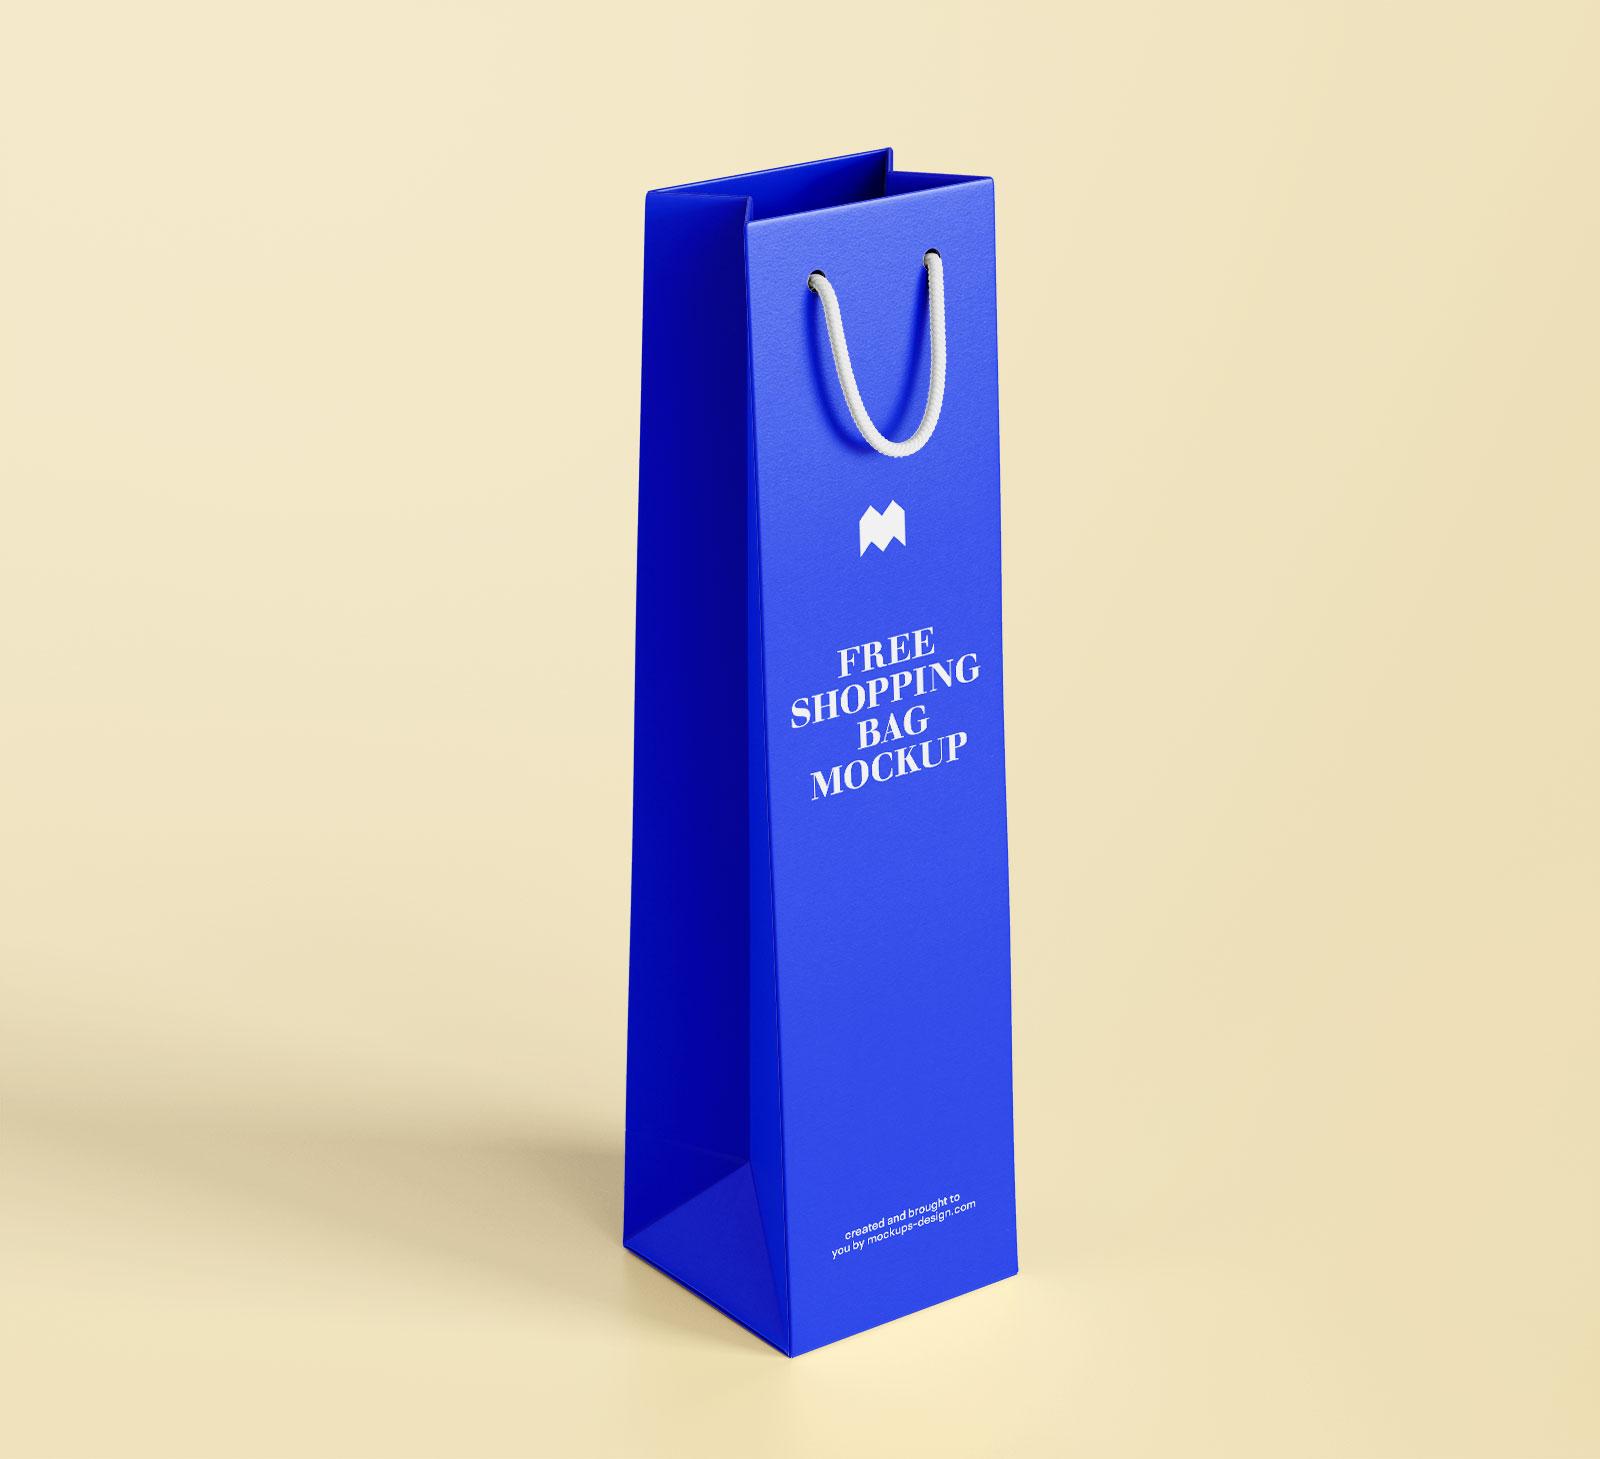 Free_Bottle_Shopping_Bag_Mockup_PSD_Set